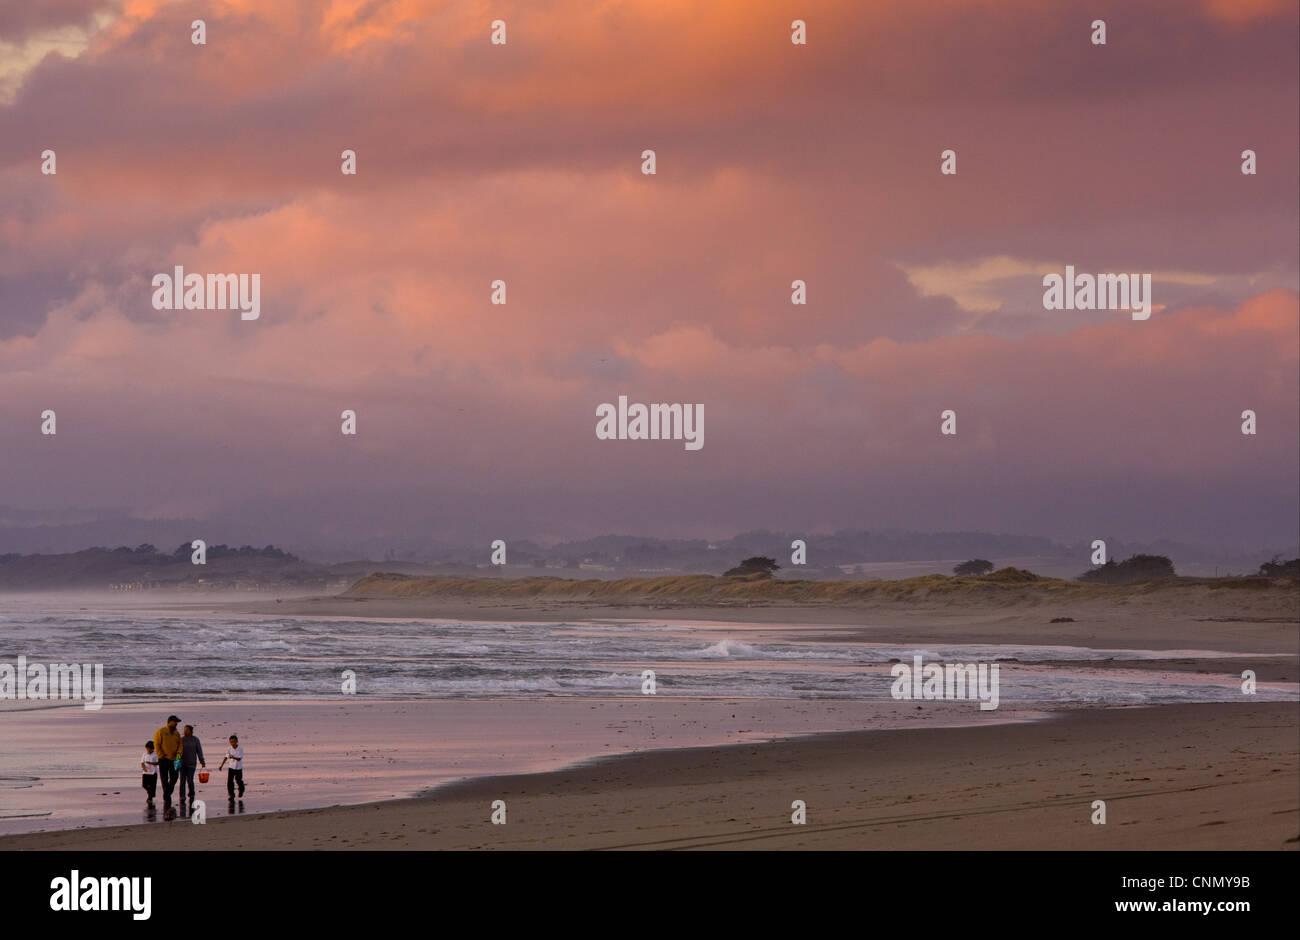 Family beach-combing on beach in evening light, Pacific Ocean, Moss Landing, Central California, U.S.A., november Stock Photo